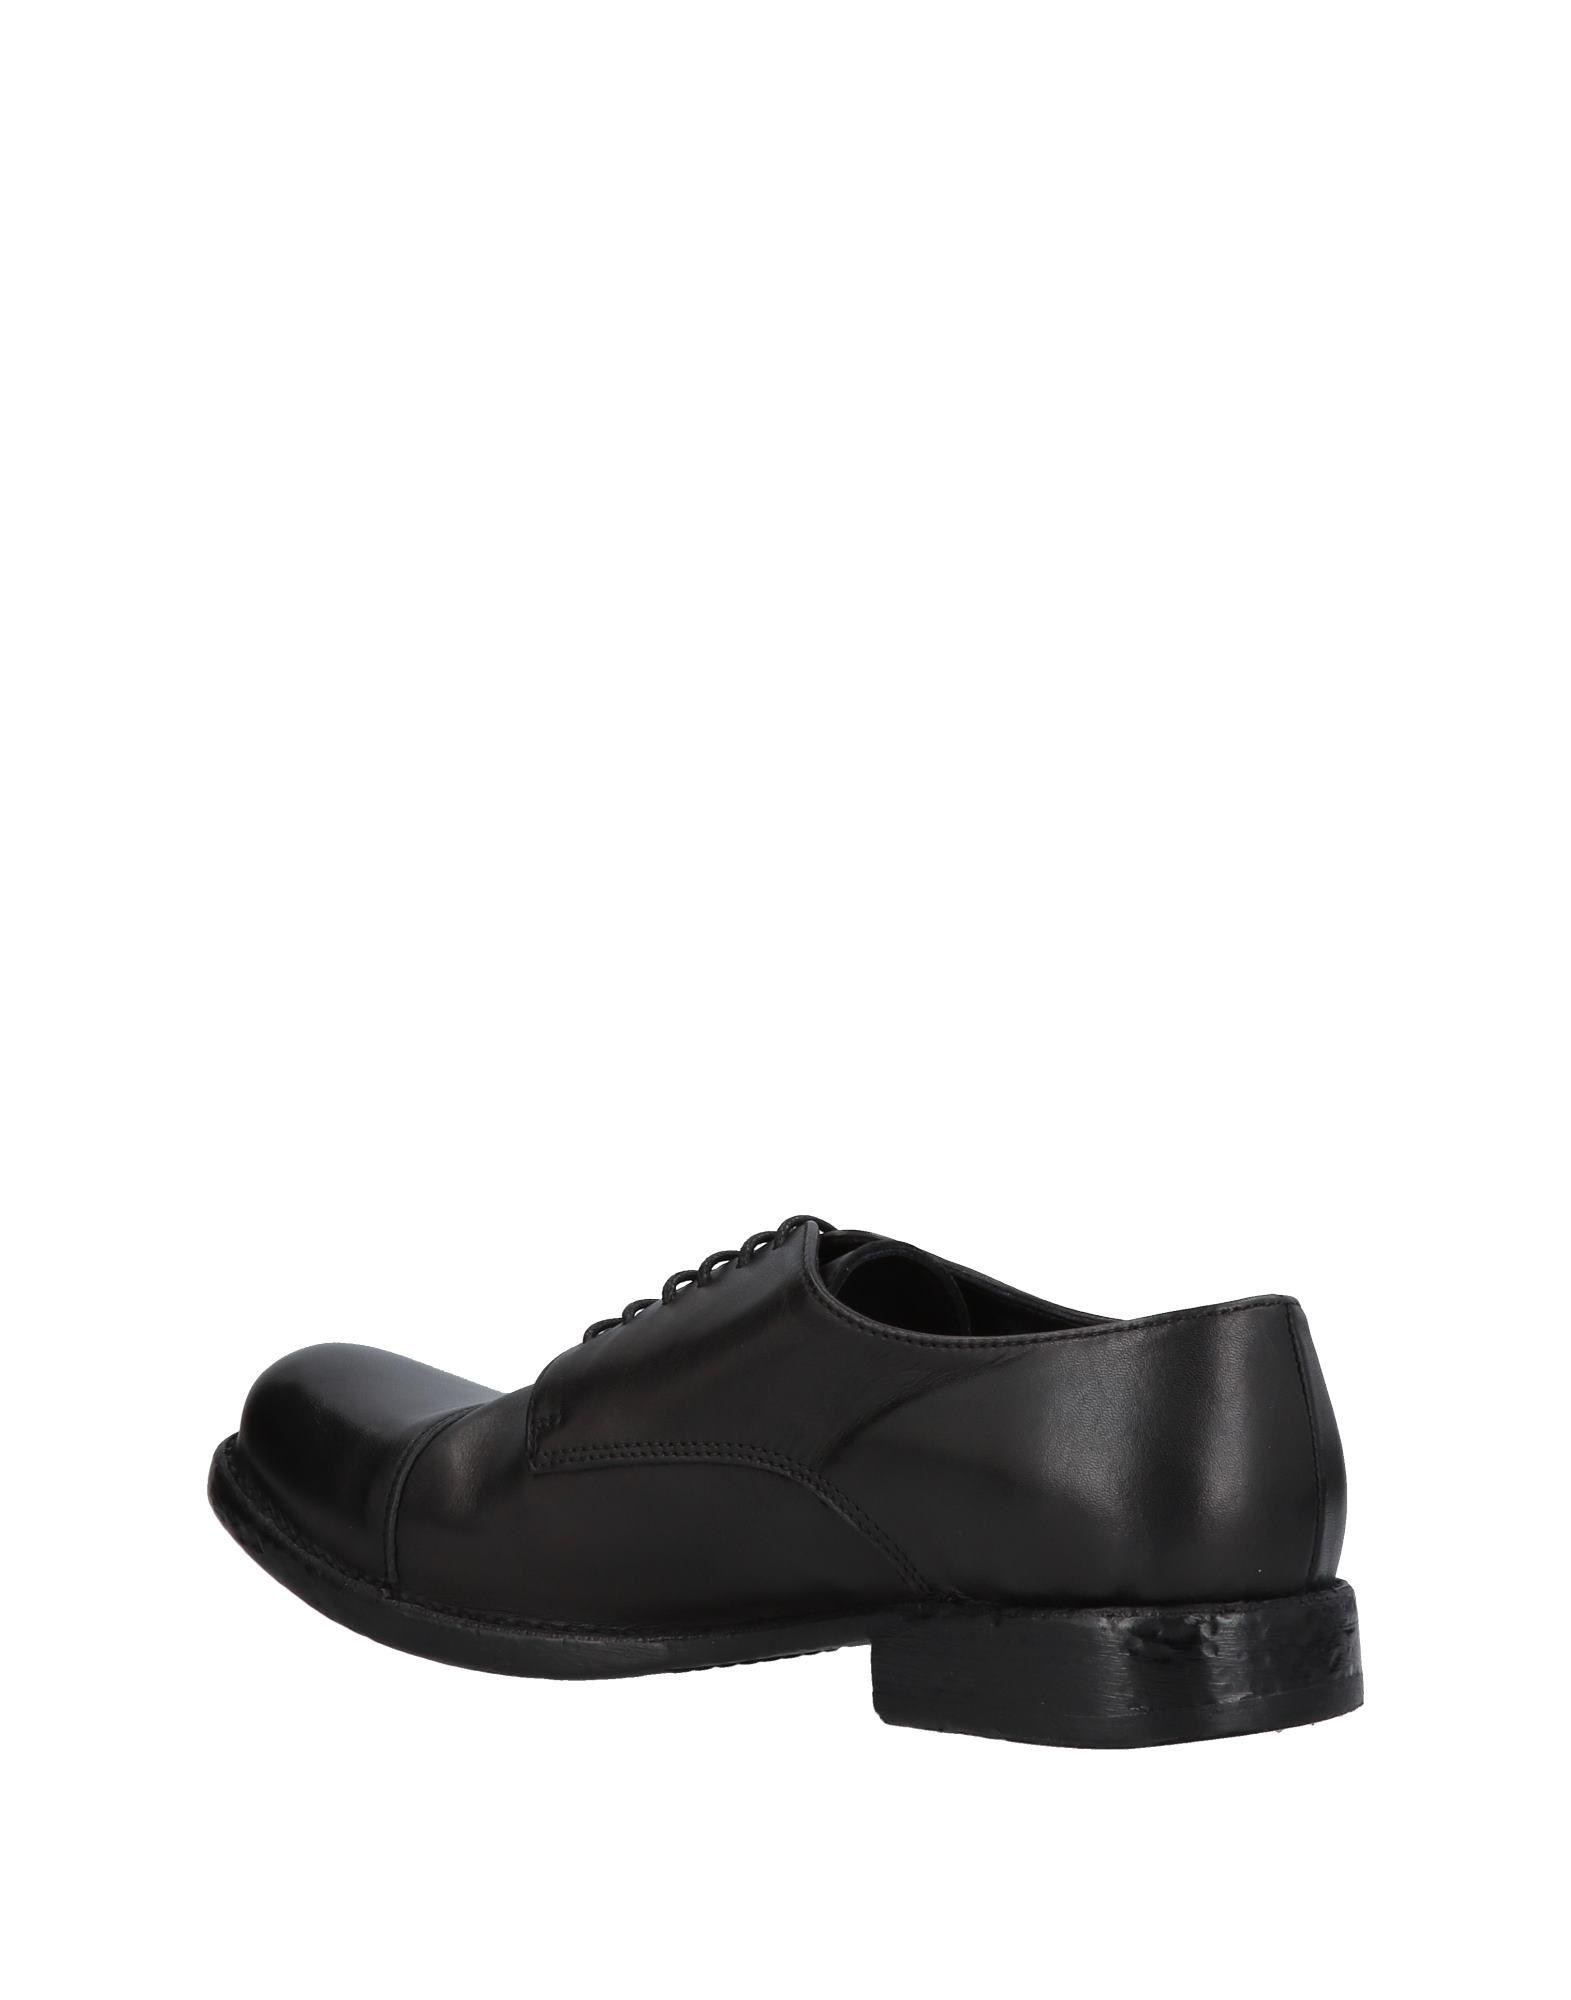 Chaussures À Lacets Open Closed  Shoes Homme - Chaussures À Lacets Open Closed  Shoes sur